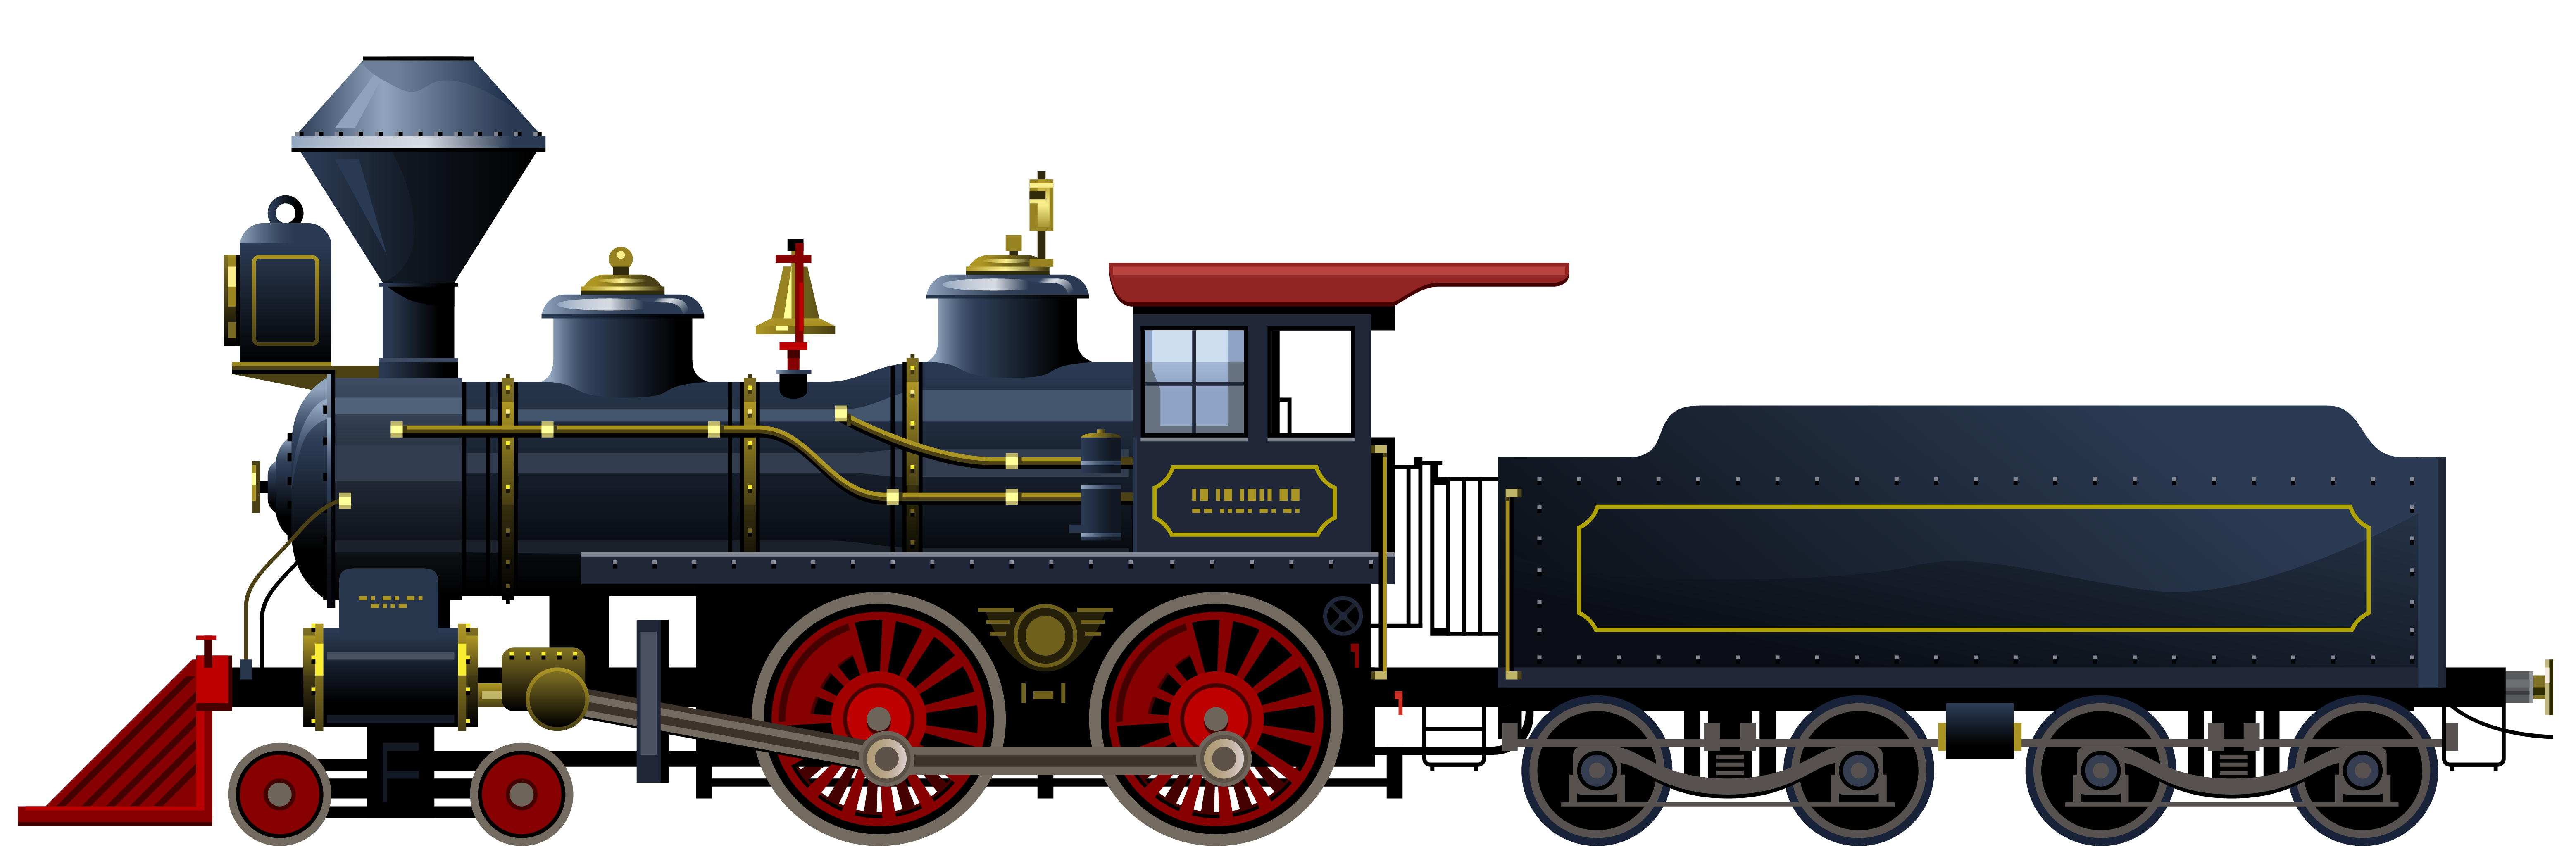 Engine clipart railway engine. Blue locomotive png best